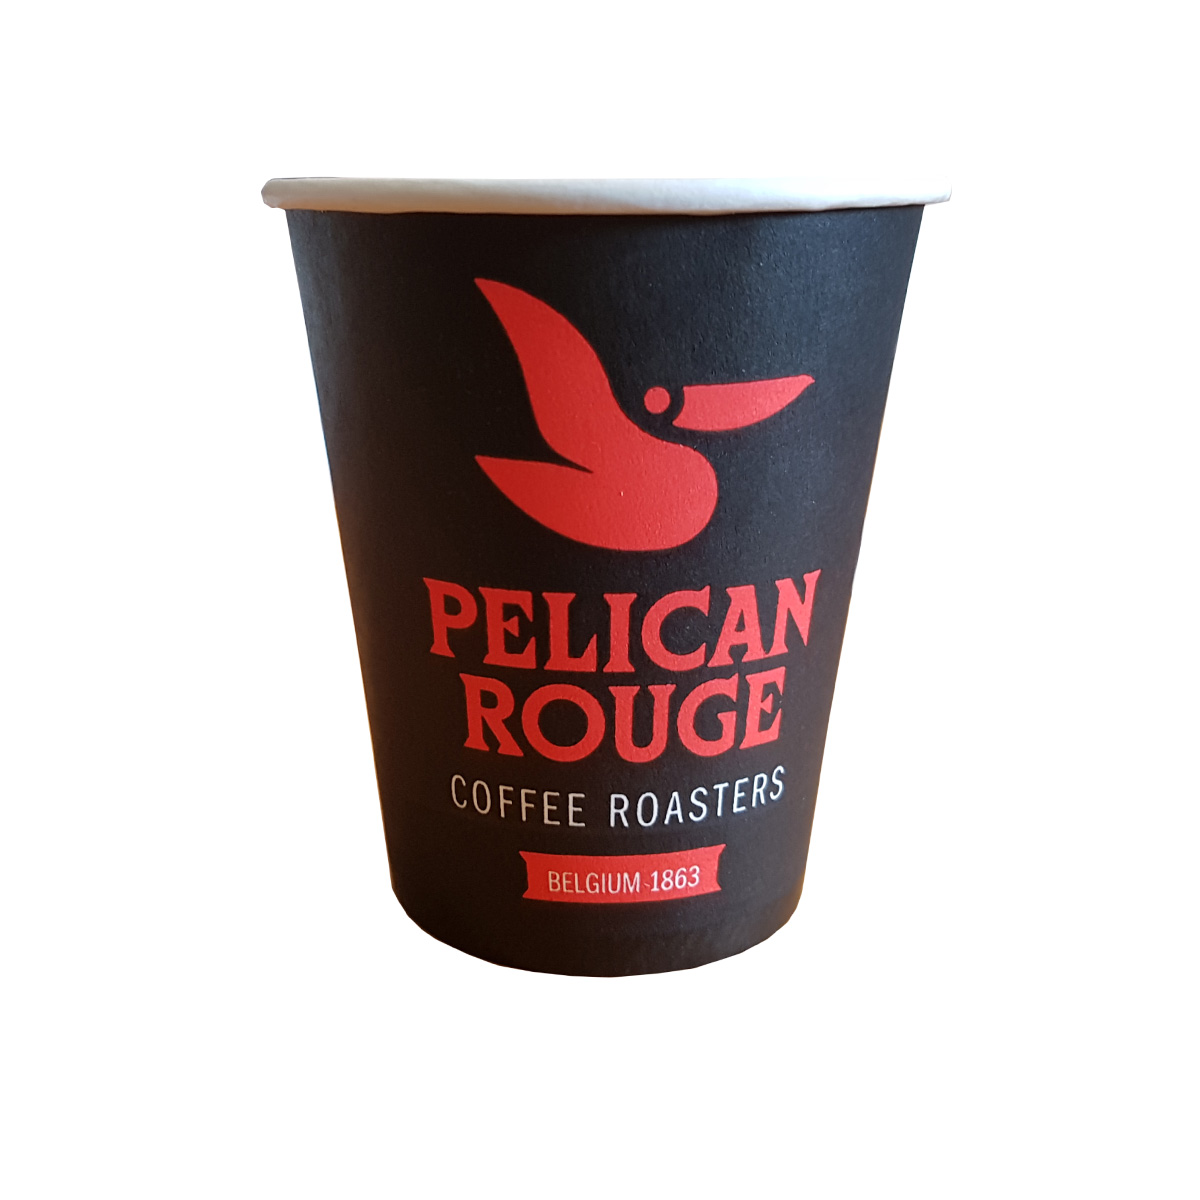 Pelican Rouge pahare carton 8 oz bax 1000 buc